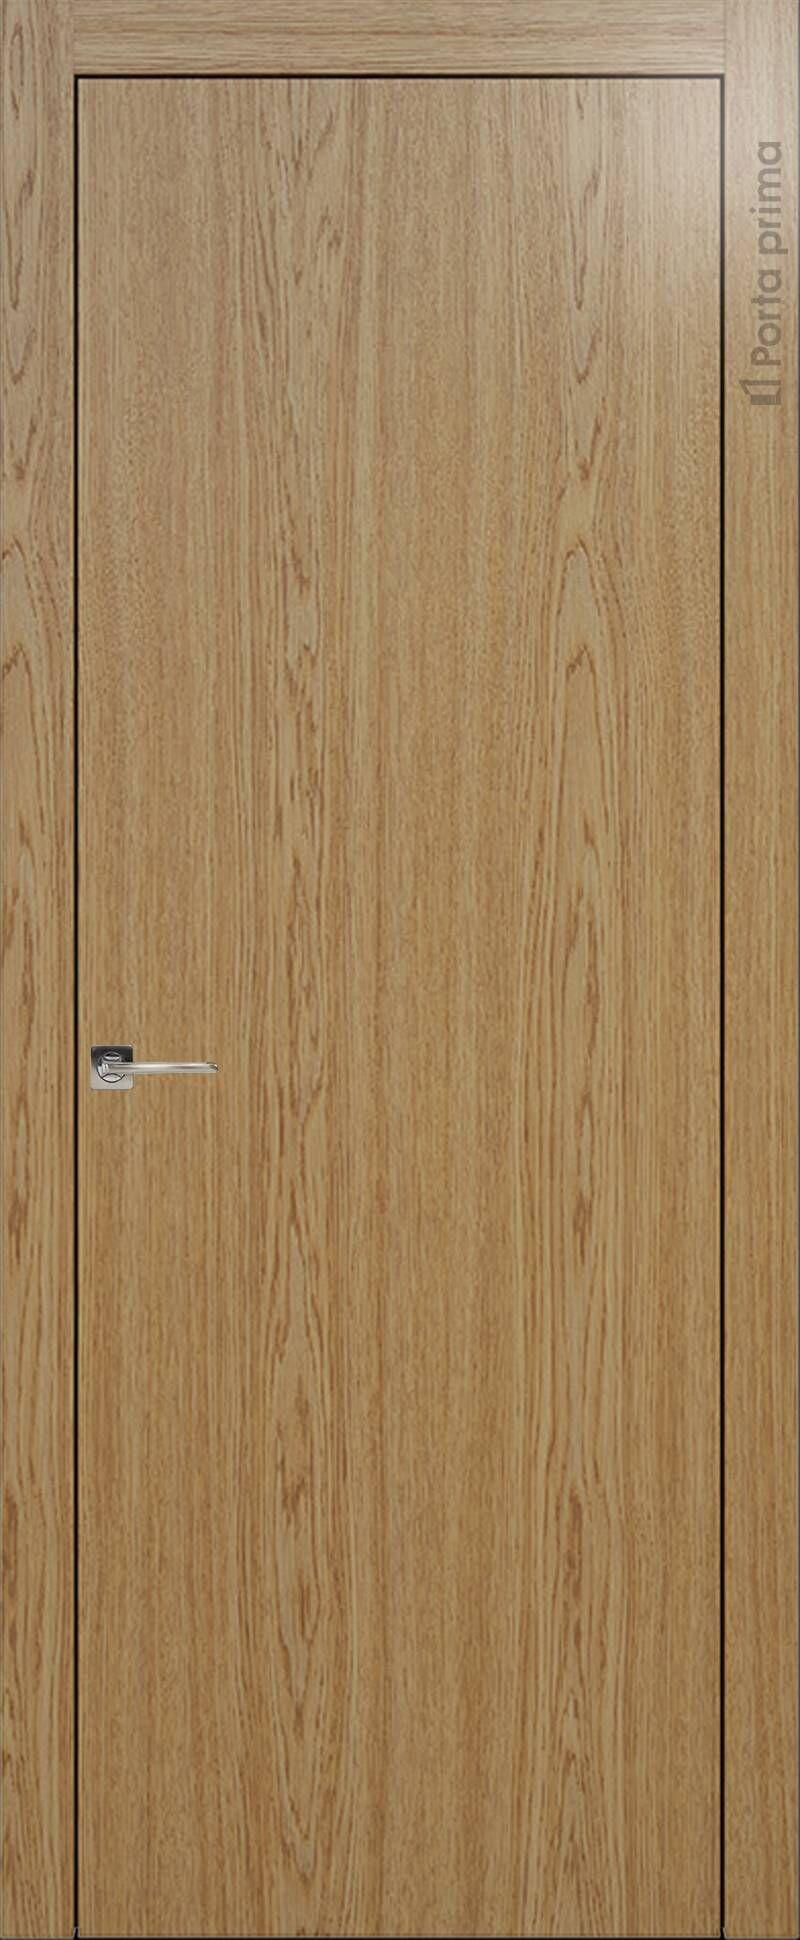 Tivoli А-1 цвет - Дуб карамель Без стекла (ДГ)